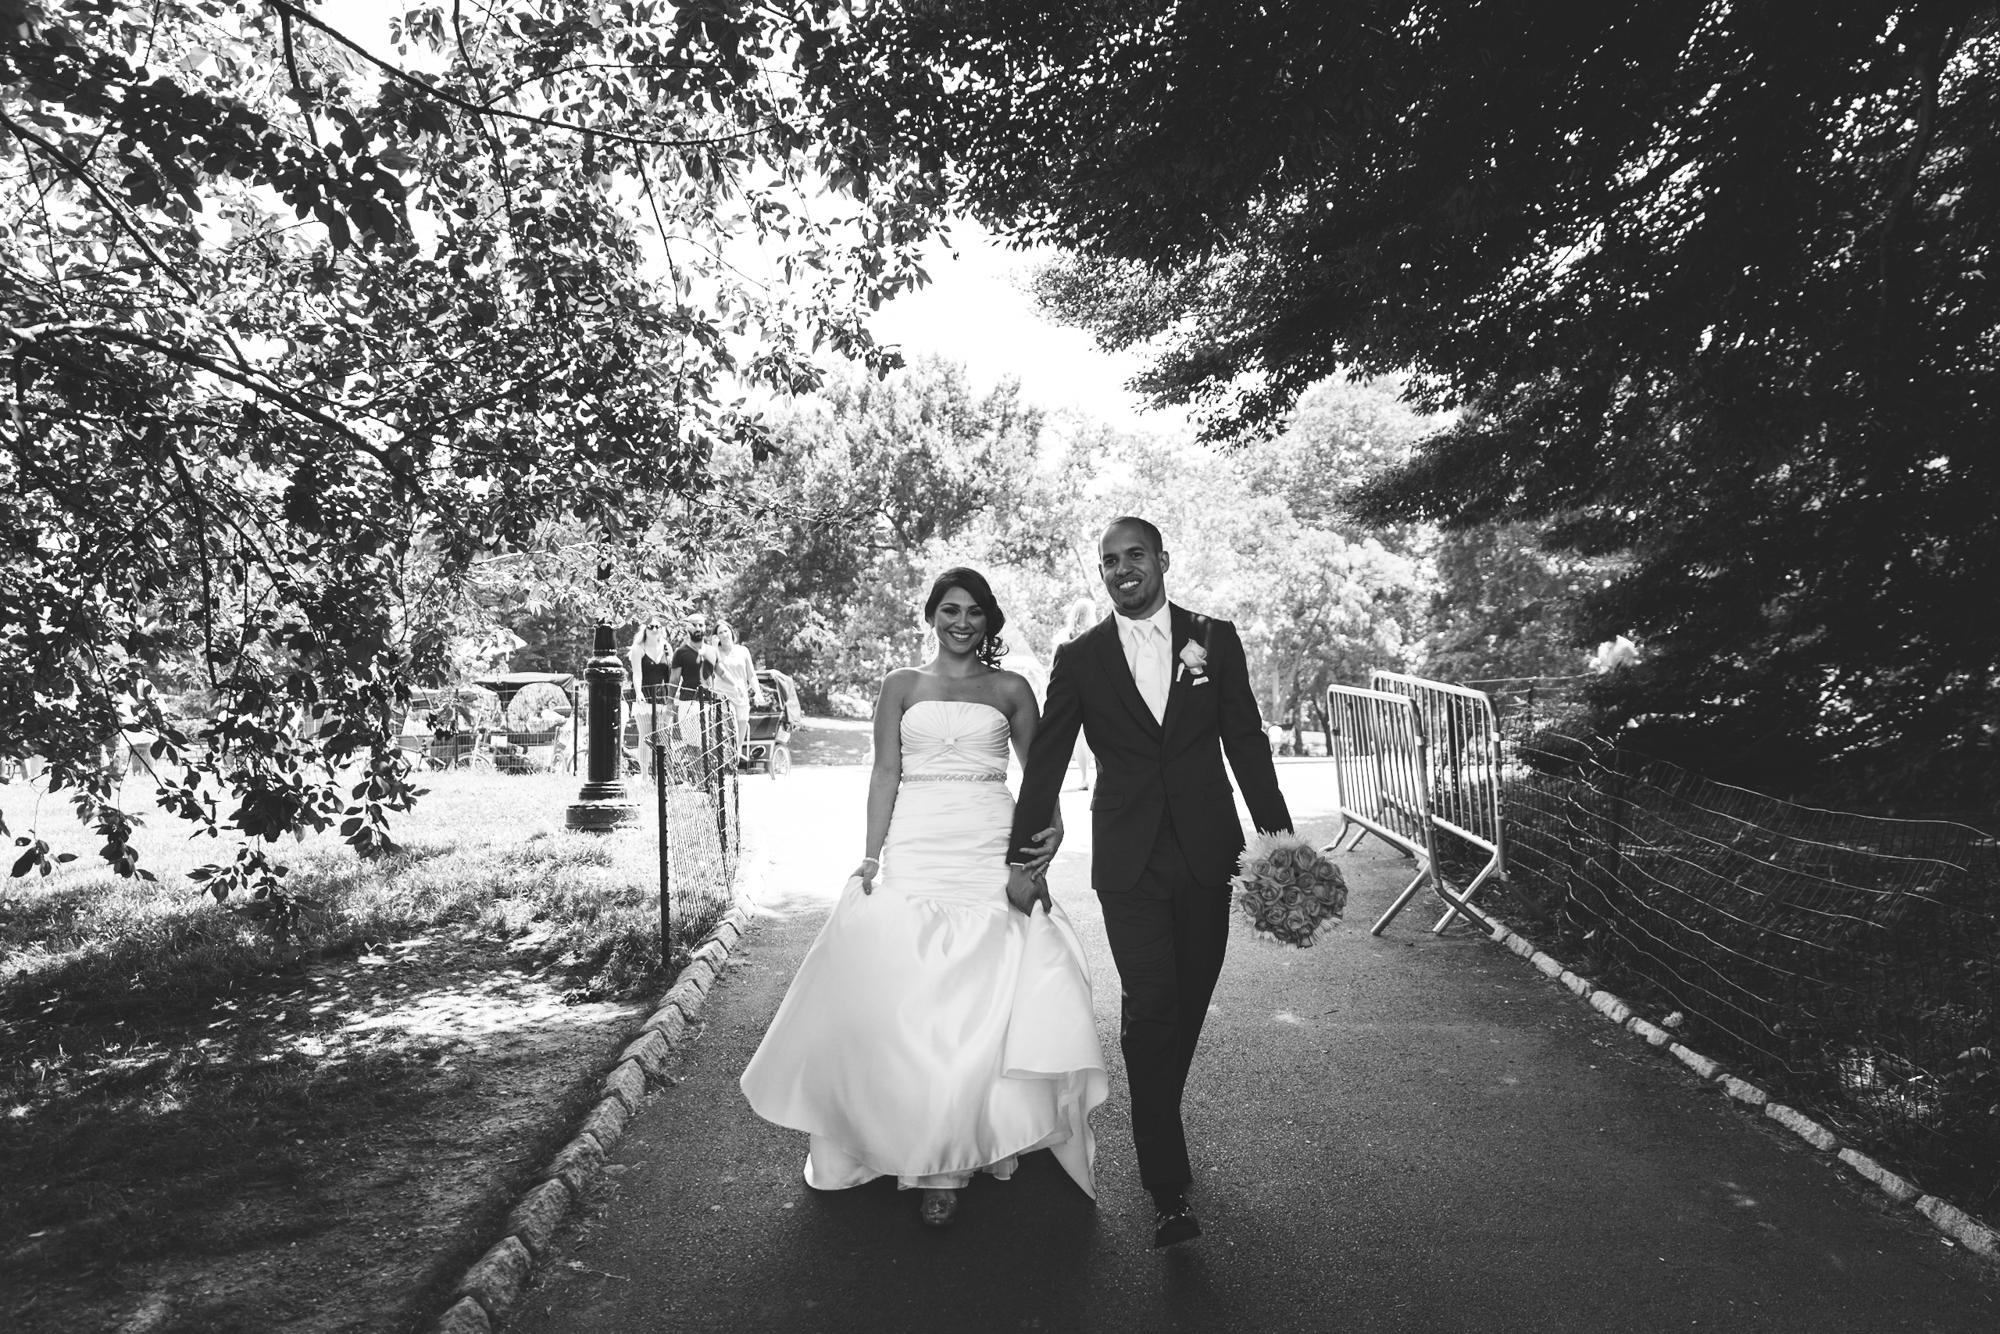 PriscillaJeffrey-Central-Park-Wedding-Elopement-Photography-NYC-25.jpg